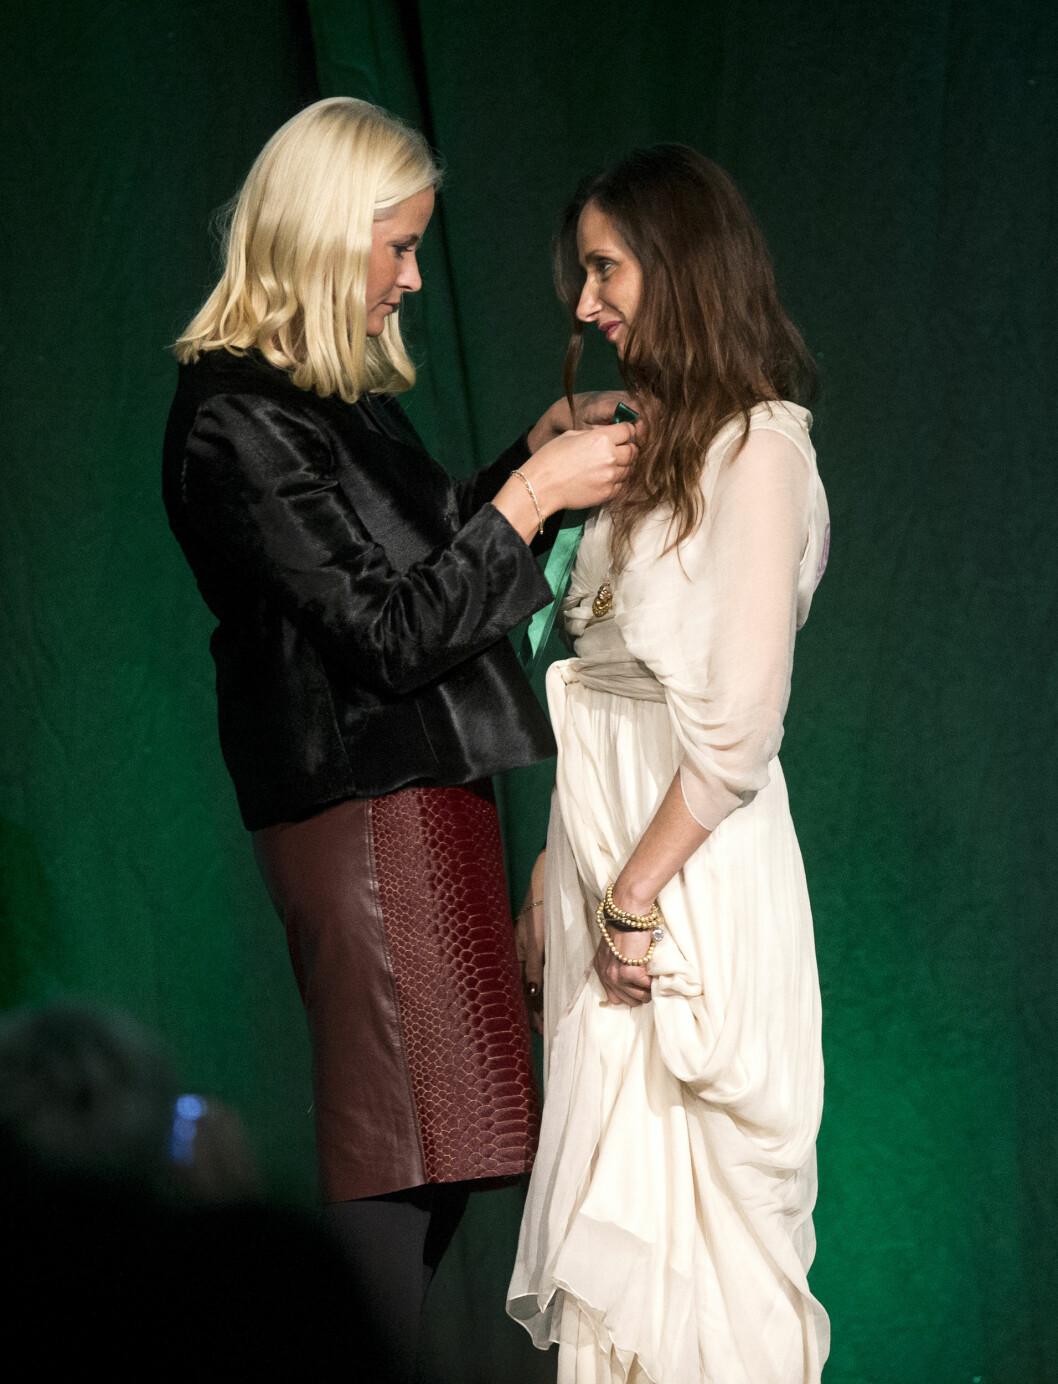 ÆRESPRIS: I februar 2014 delte kronprinsesse Mette-Marit ut Nåløyets grønne pris til Leila Hafzi.  Foto: Andreas Fadum/Se og Hør